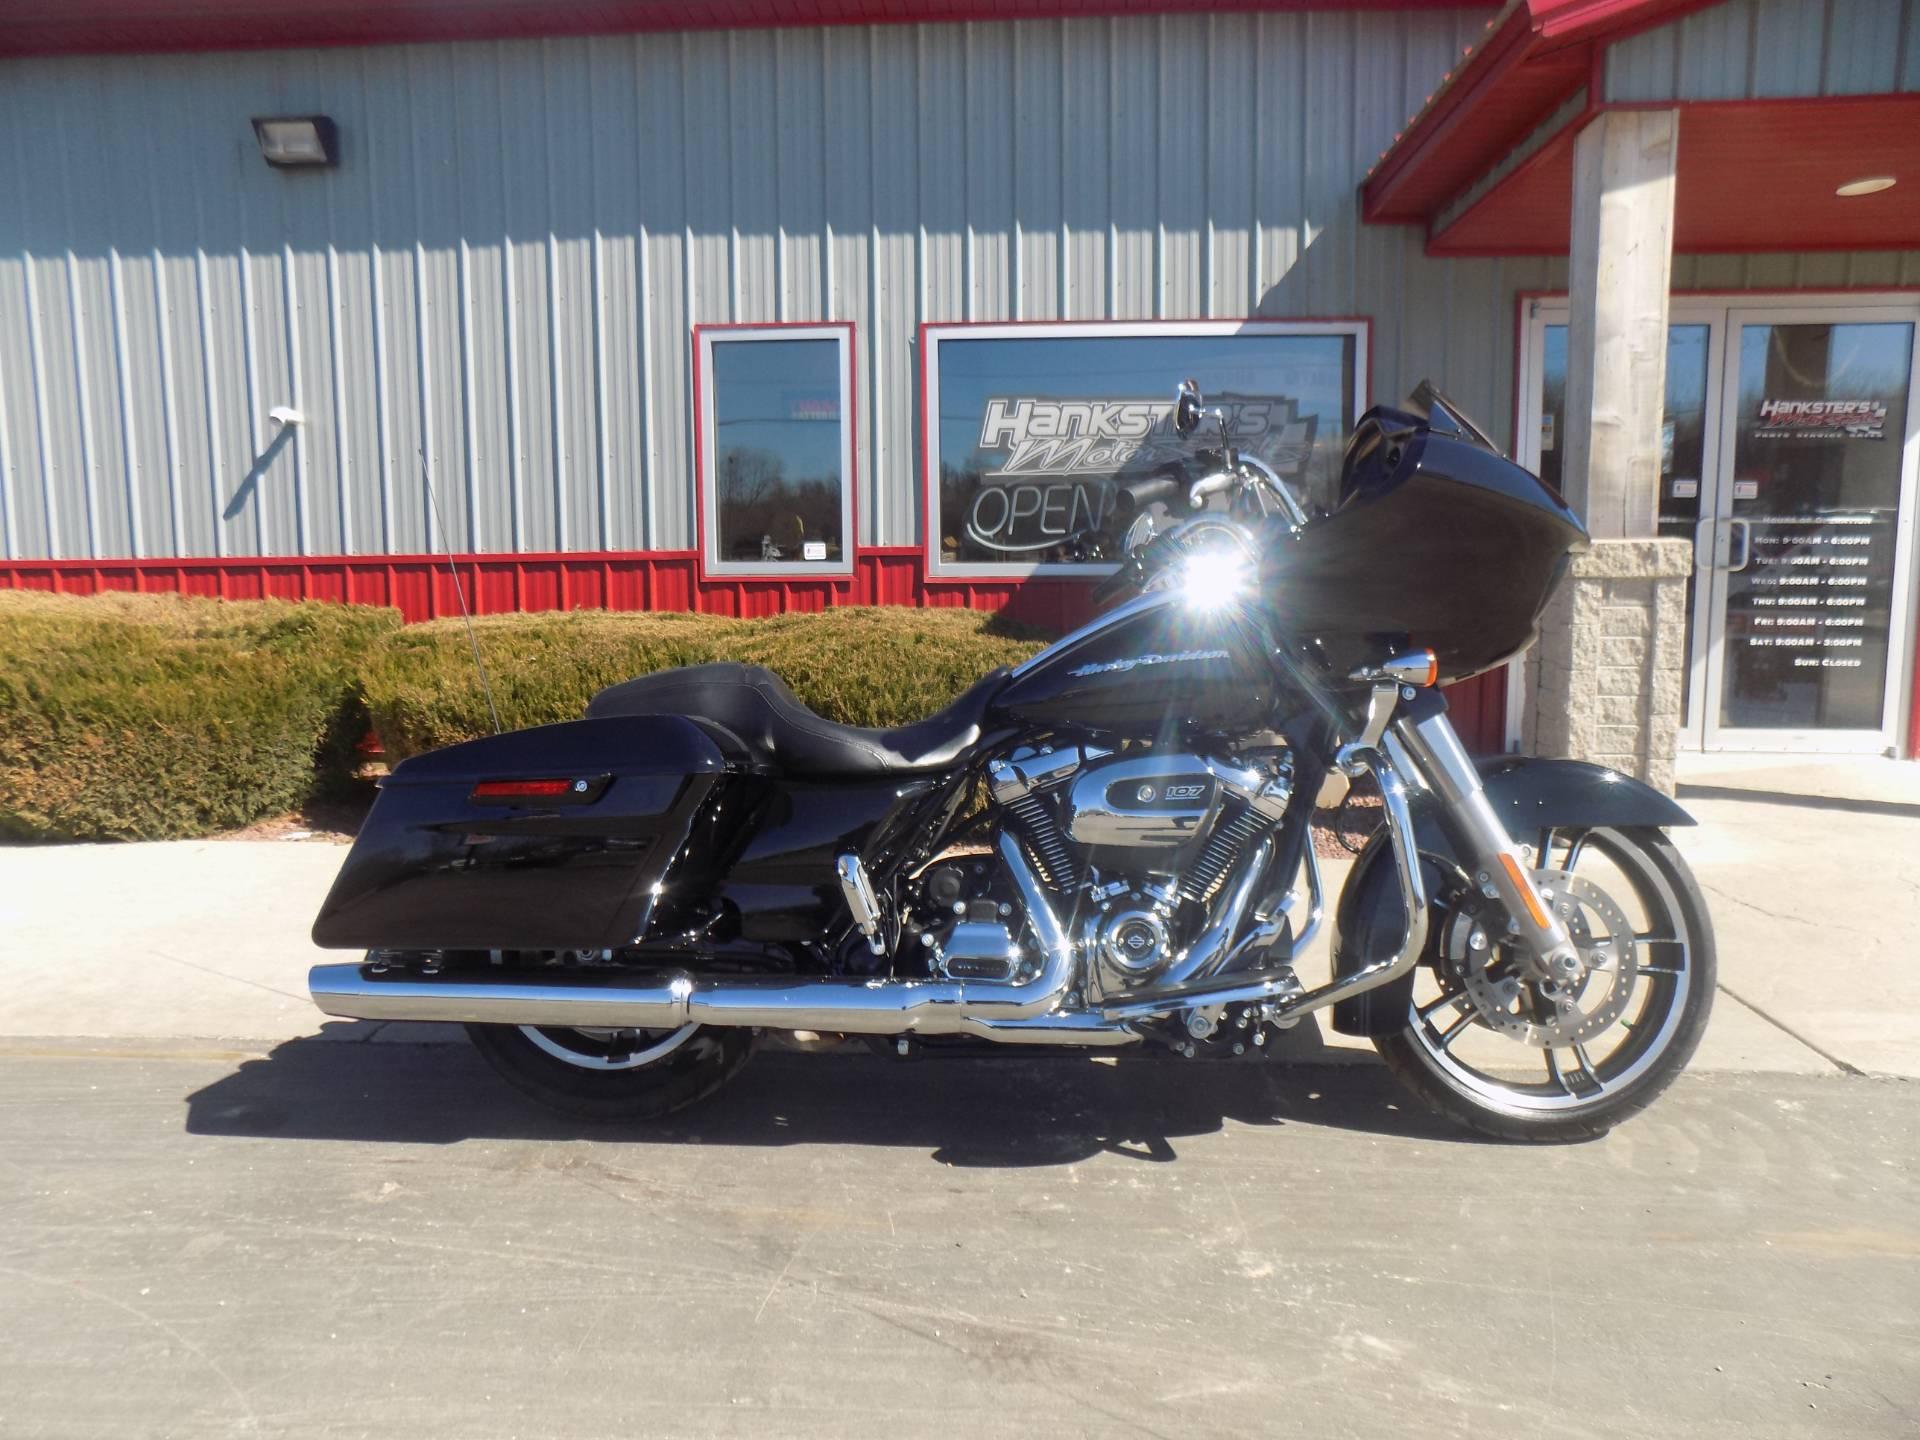 2017 Harley Davidson Road Glide Special In Janesville Wisconsin